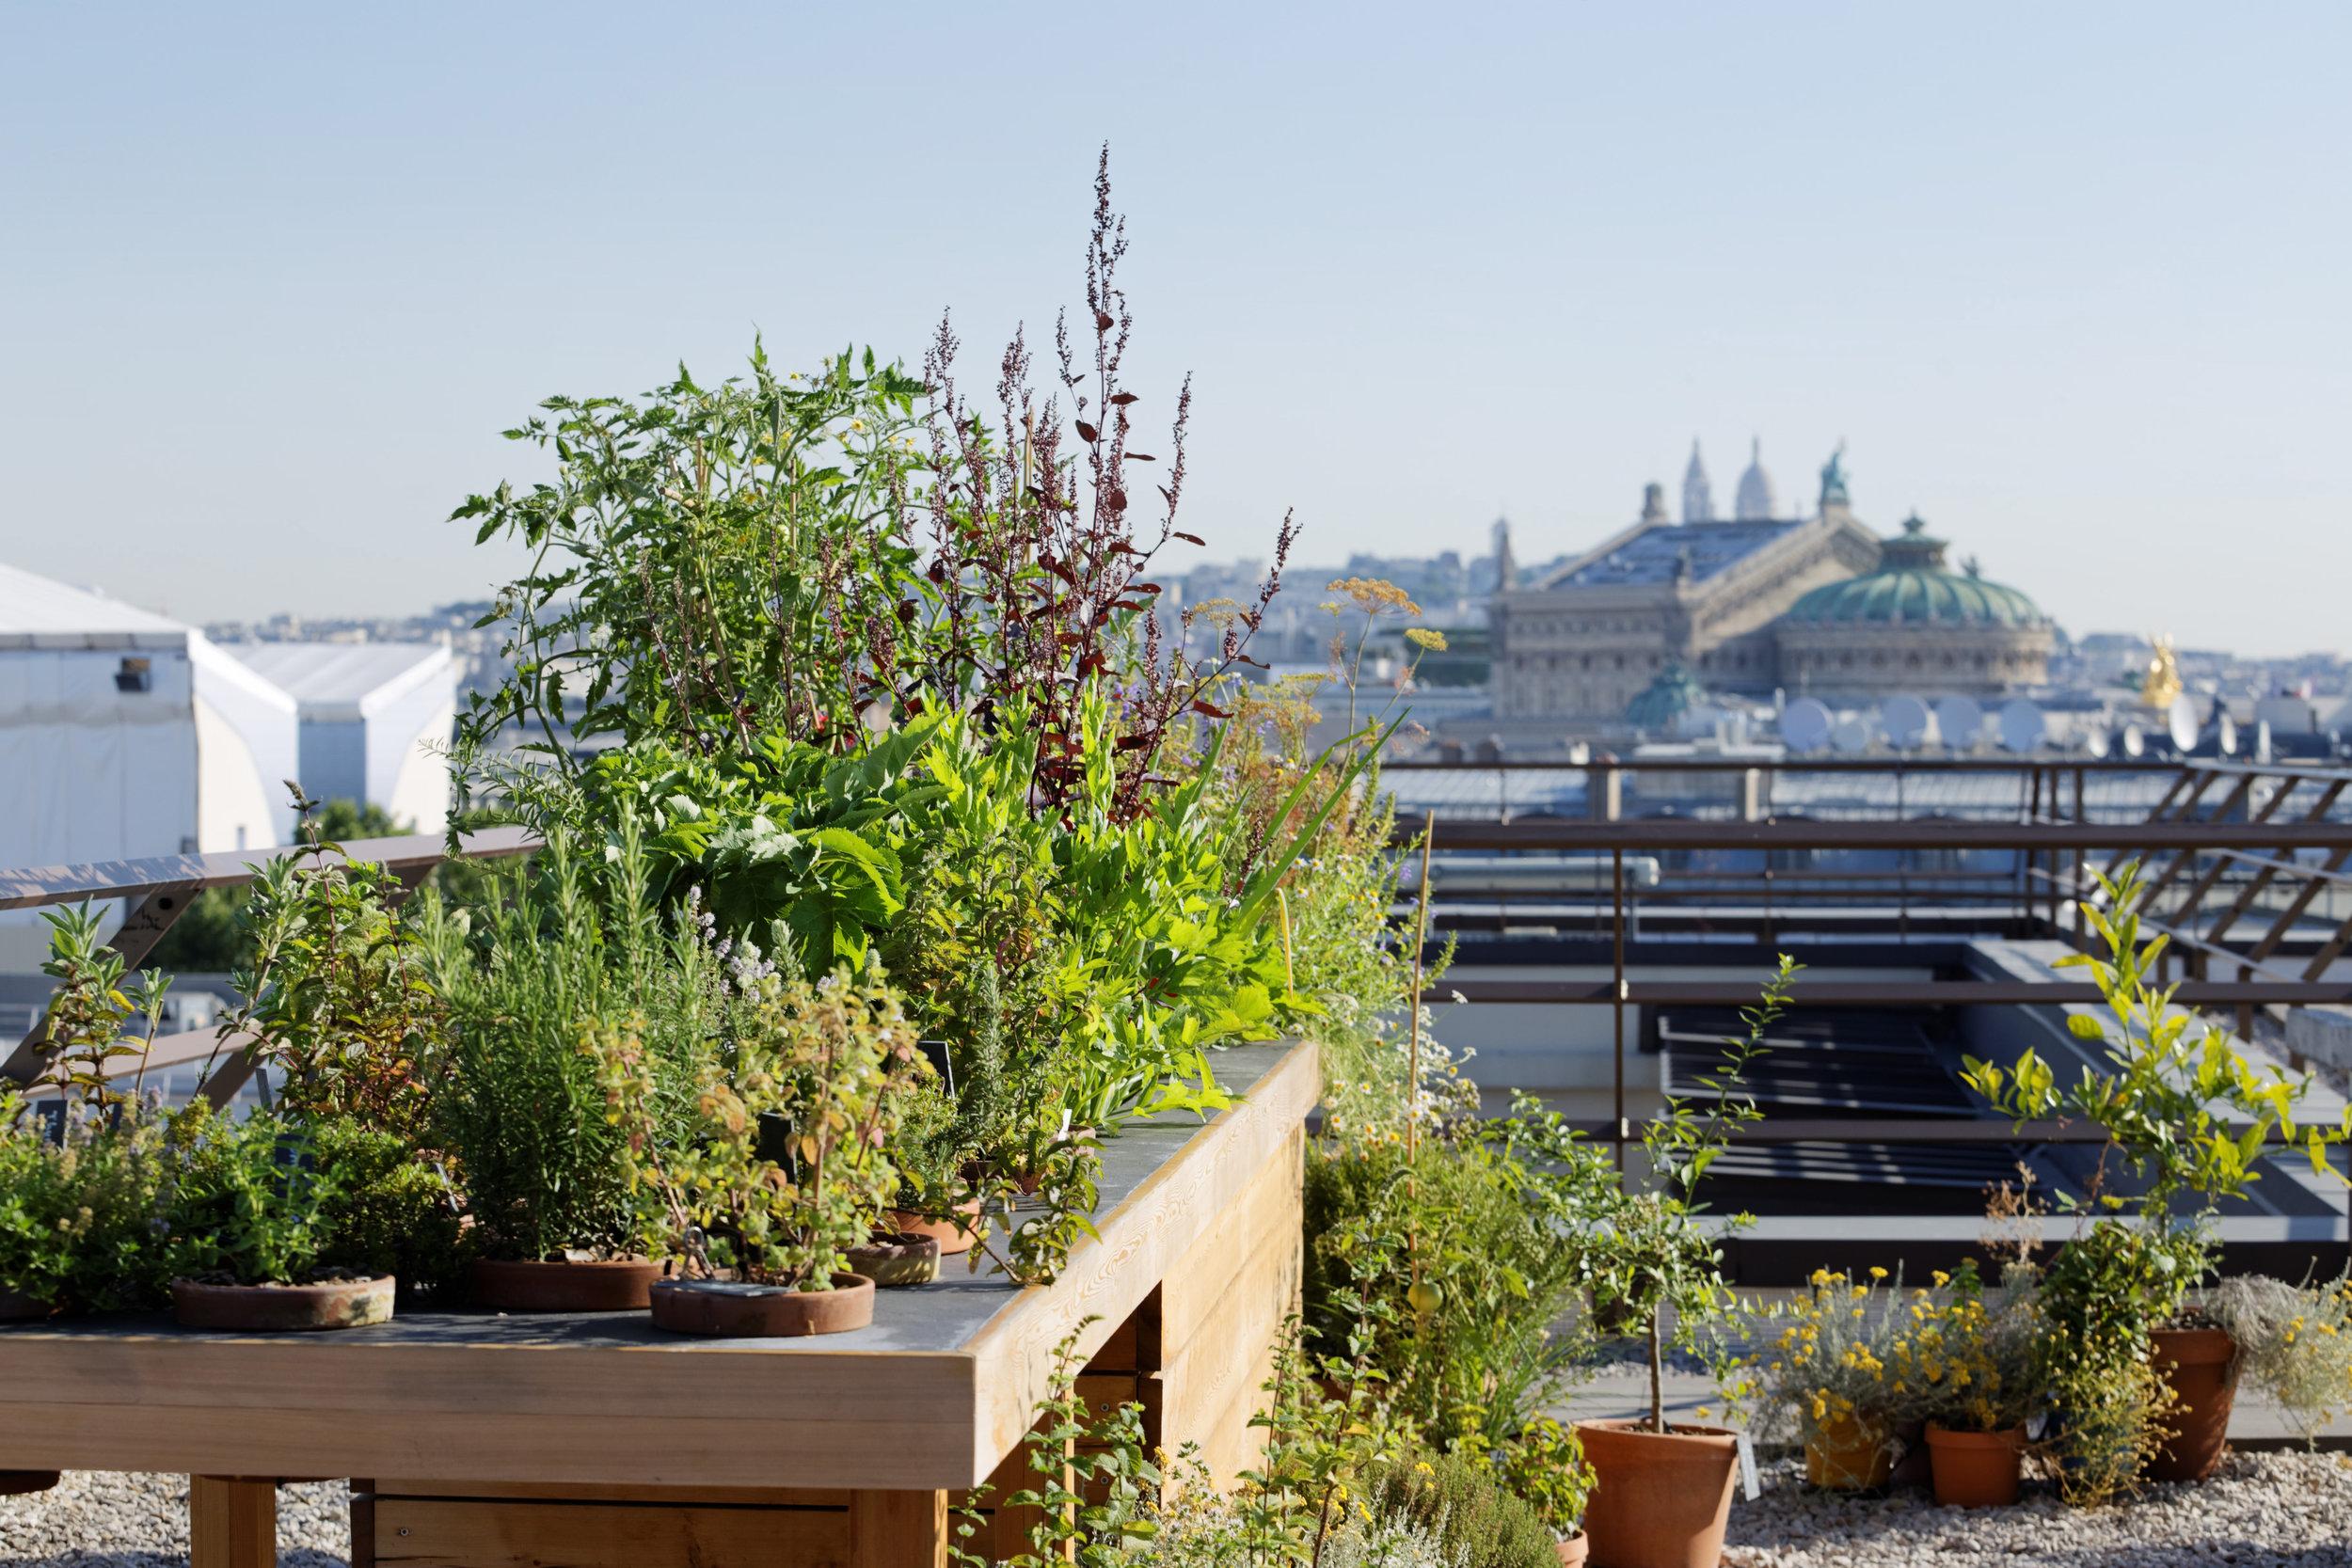 hotel_mandarin_oriental_paris_terraces_gardens_vegetable_garden_thierry_marx_christophe_gautrand_landscape_outdoor_designer_8.jpg